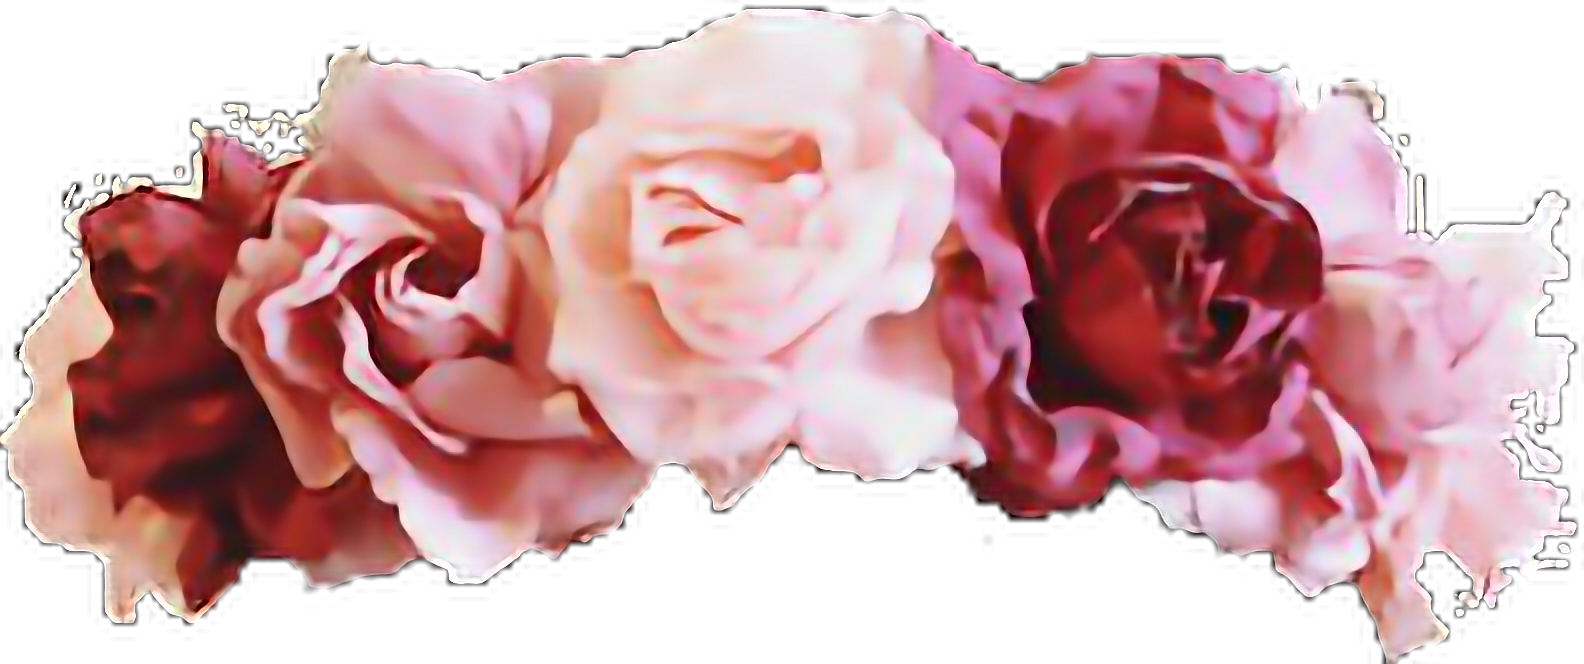 Flower crown overlays picsart digitalspacefo flower crown overlays picsart izmirmasajfo